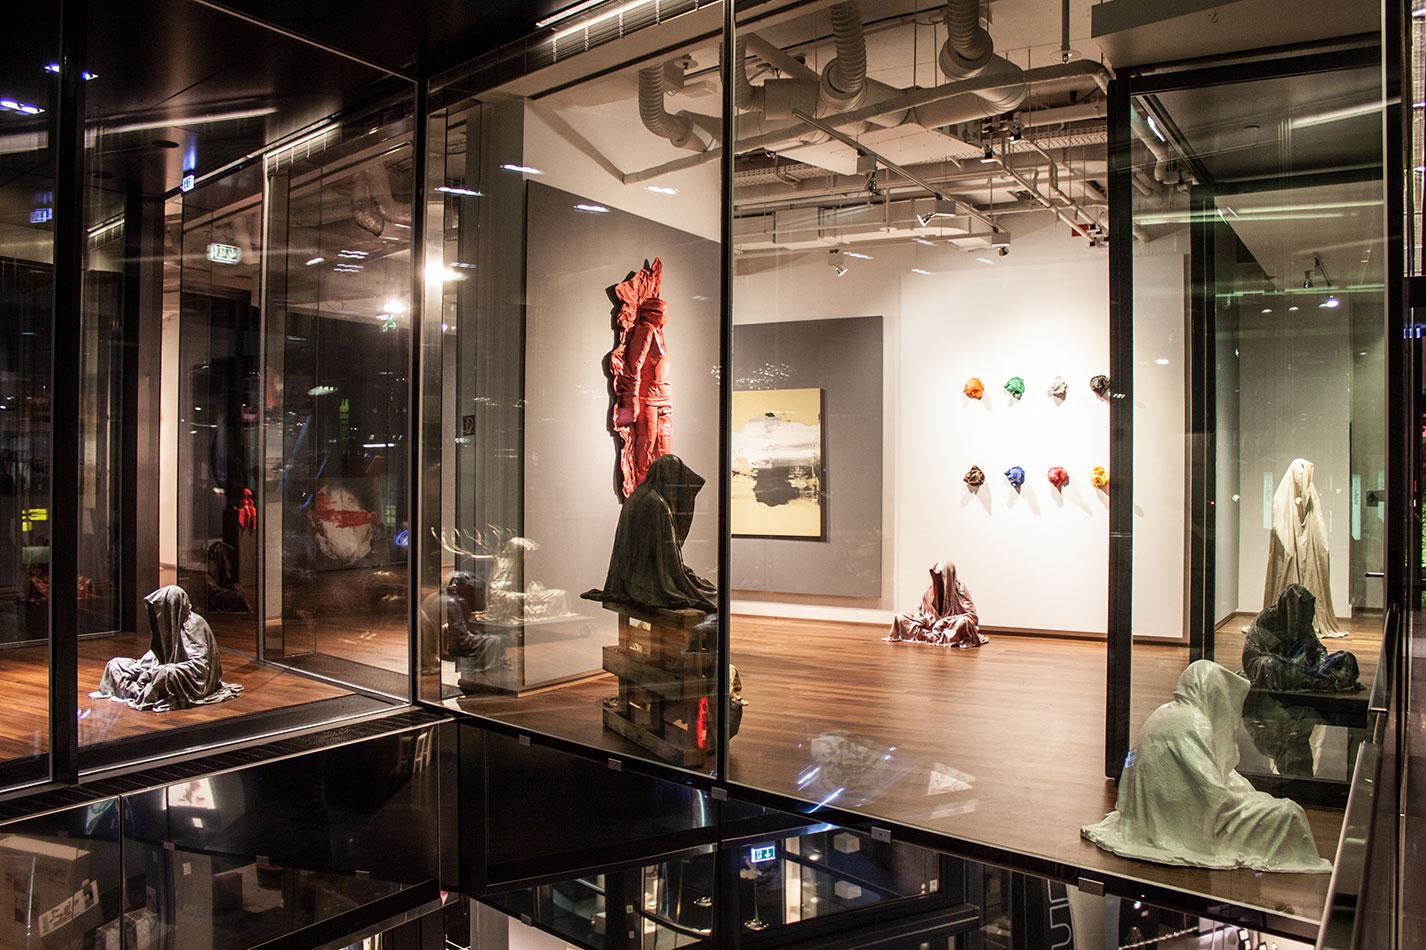 stilwerk-wien-designtower-vienna-show-guardians-of-time-waechter-der-zeit-manfred-kielnhofer-modern-contemporary-fine-art-design-sculpture-3d-arts-3964